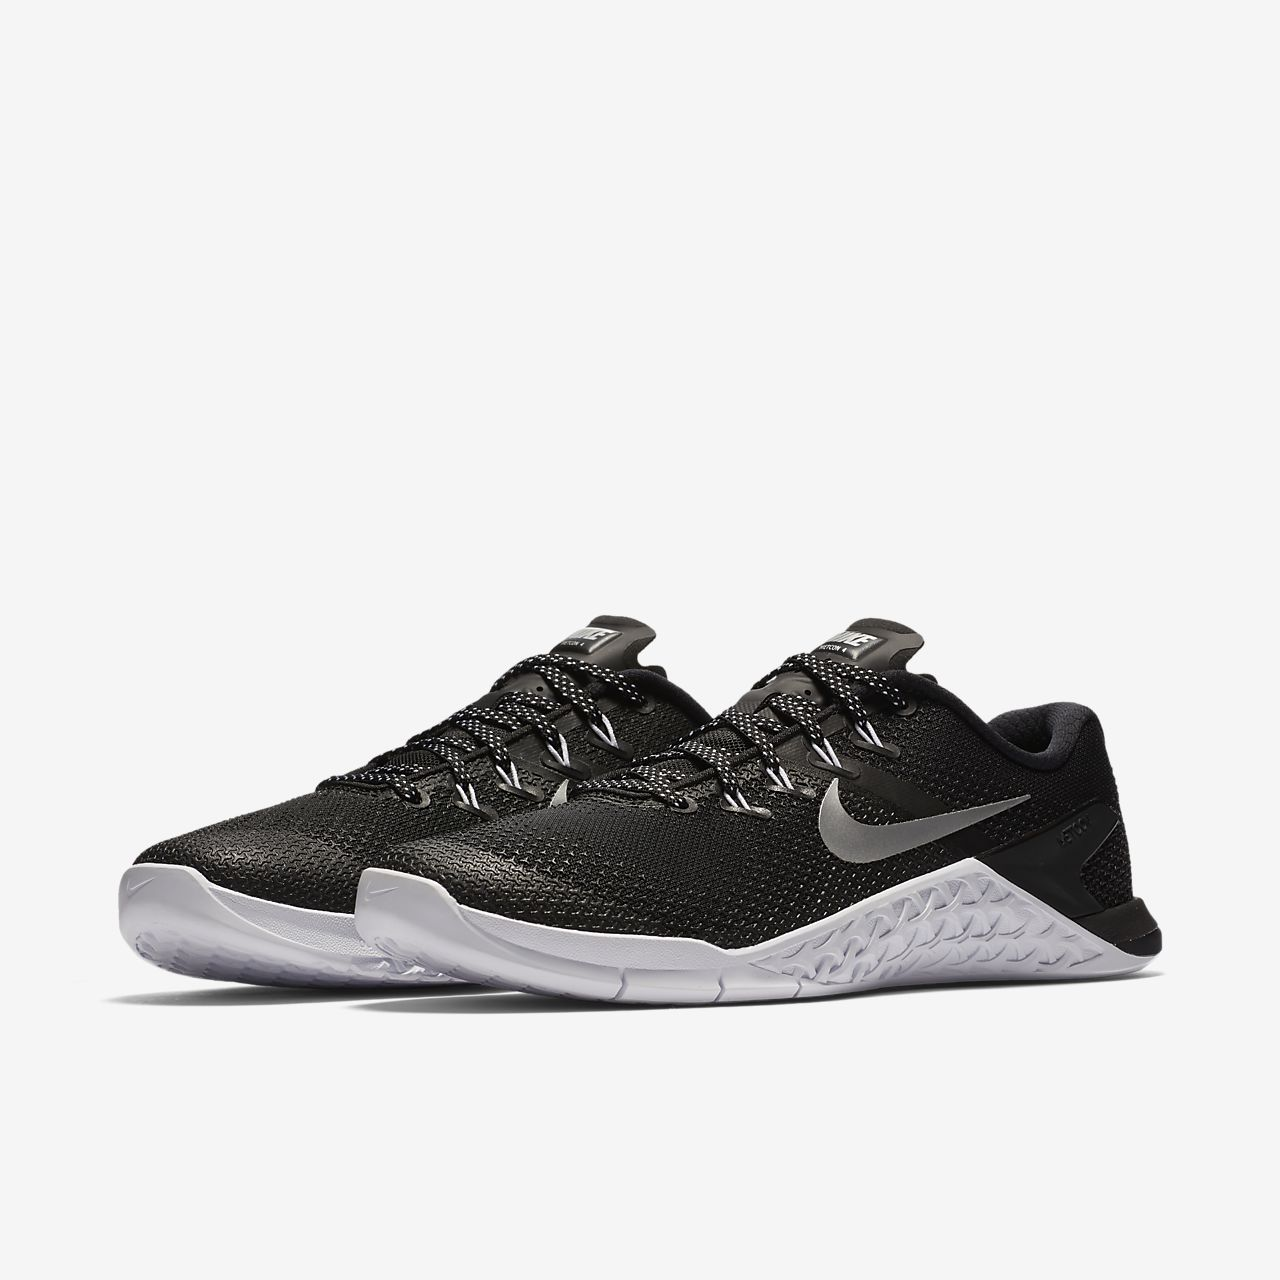 82e8ef3ab316 Women s Cross Training Weightlifting Shoe. Nike Metcon 4